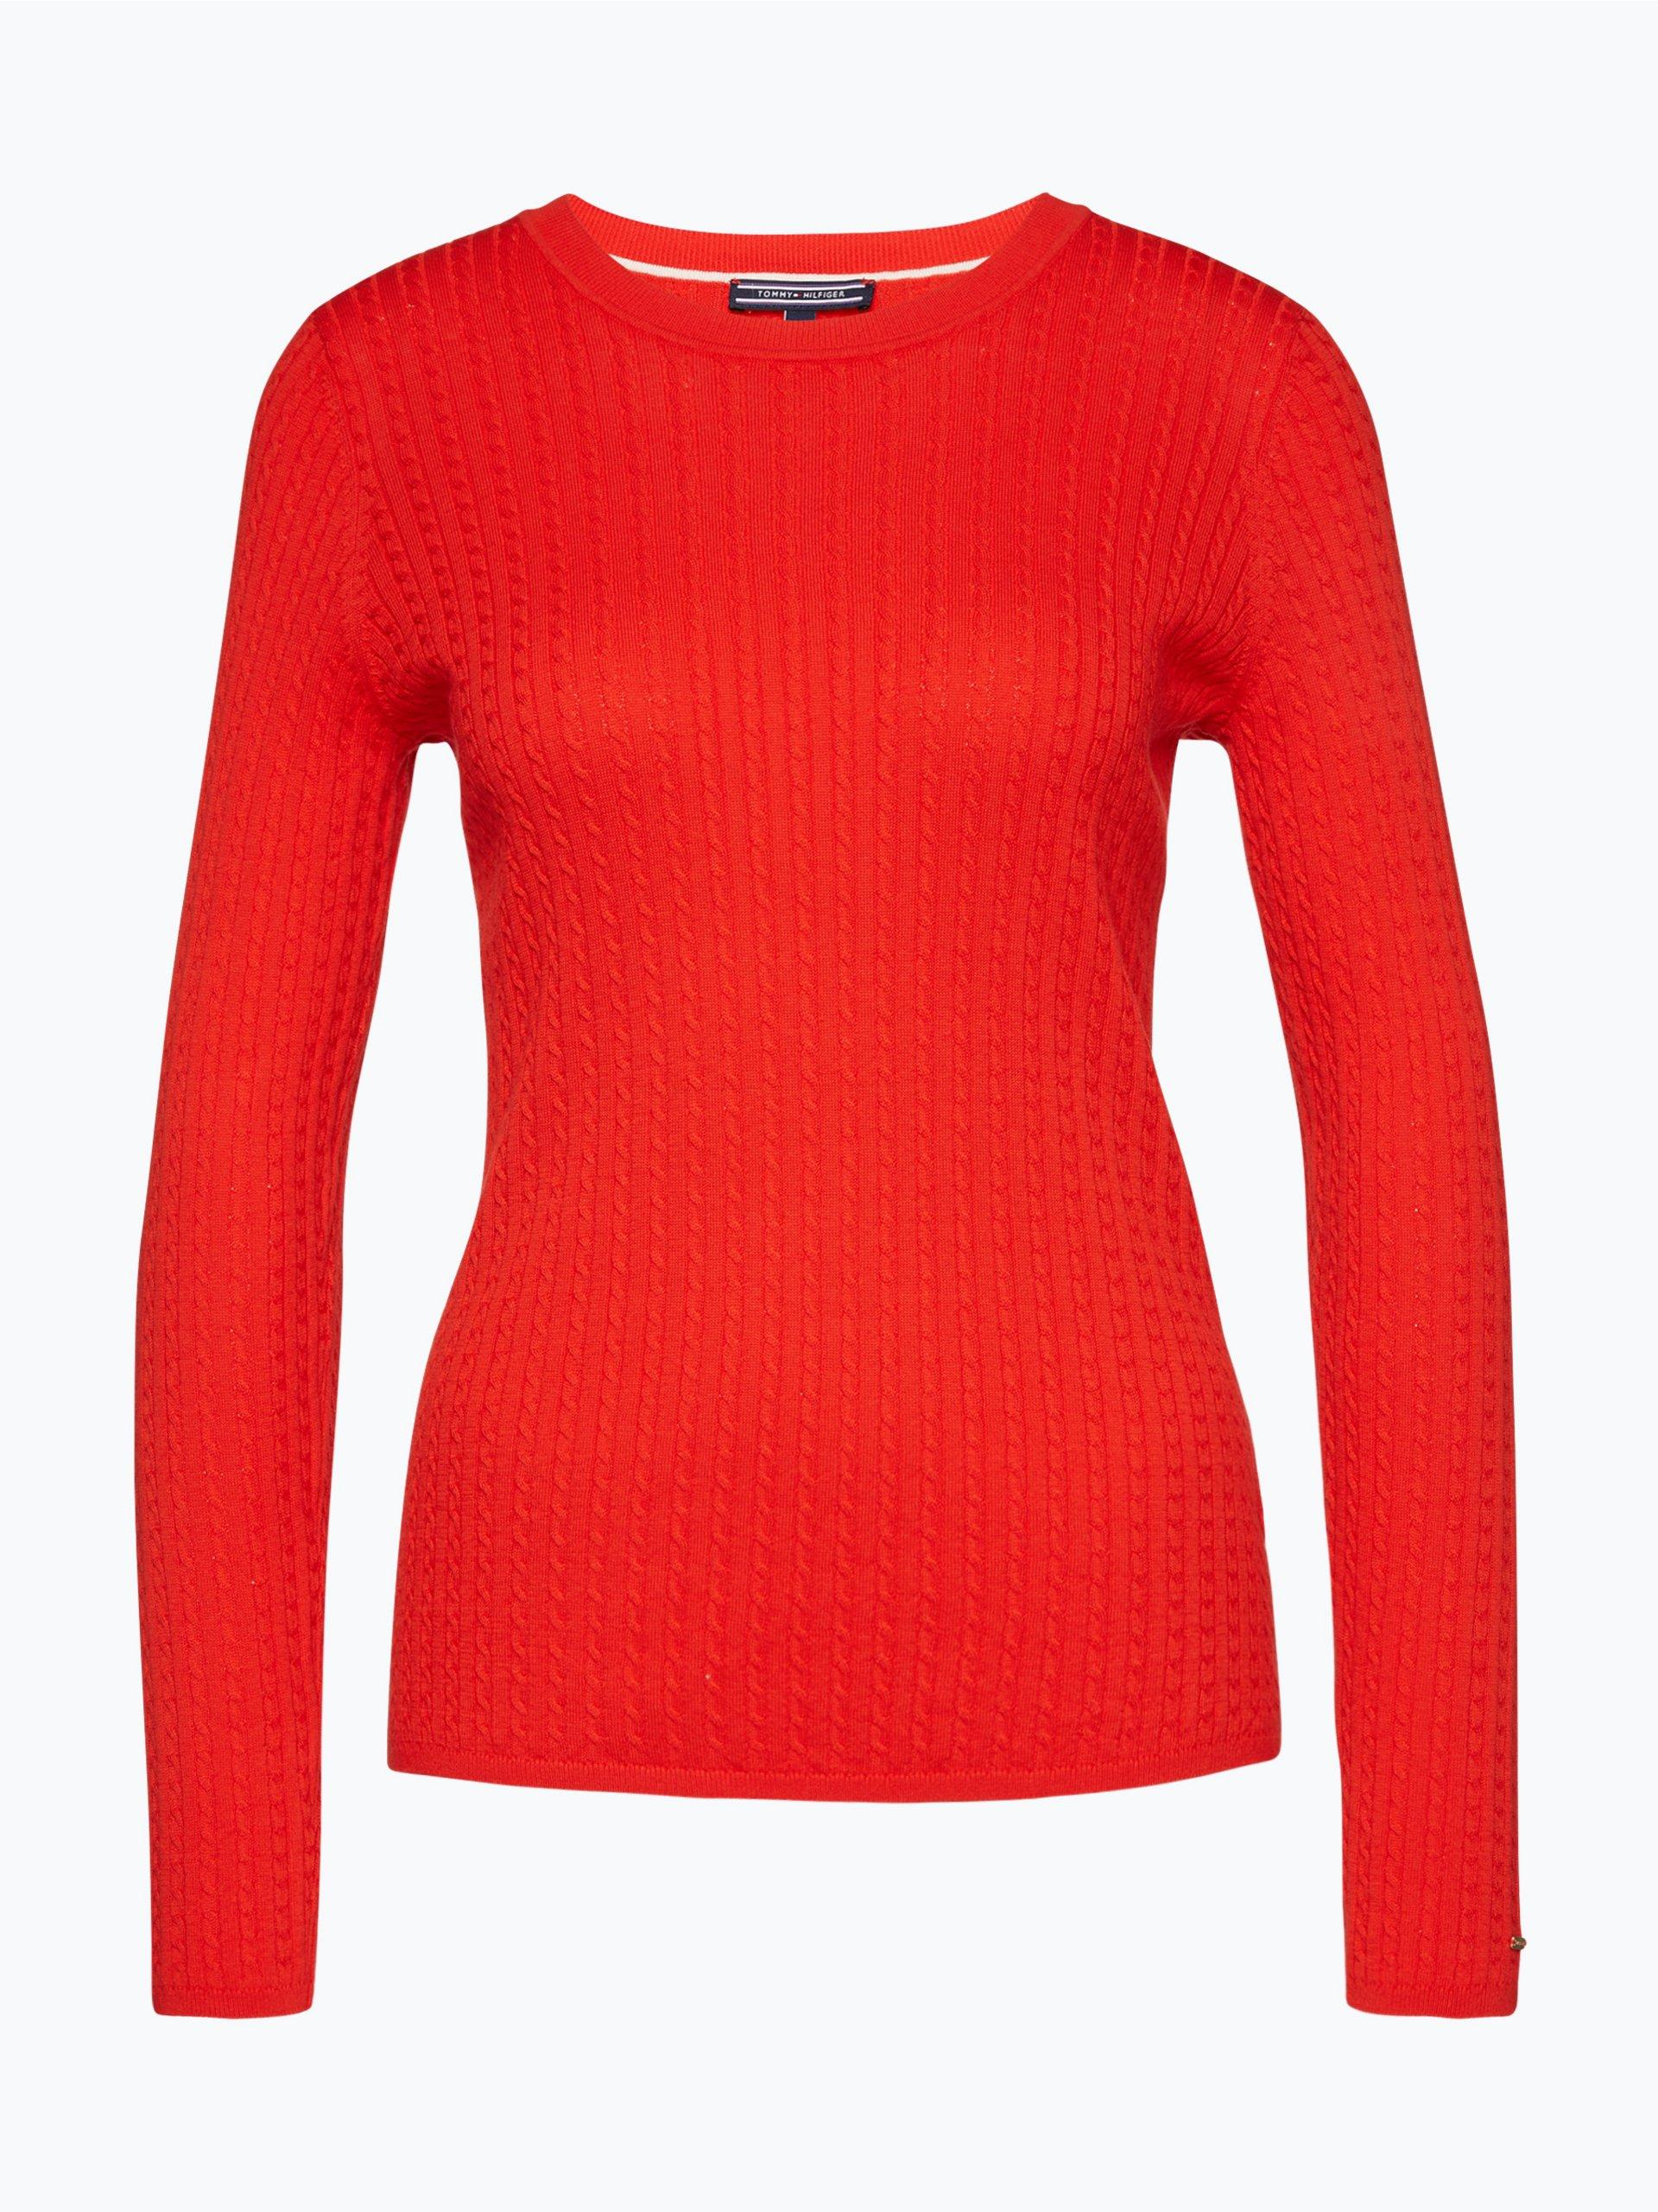 tommy hilfiger damen pullover erca rot gestreift online. Black Bedroom Furniture Sets. Home Design Ideas